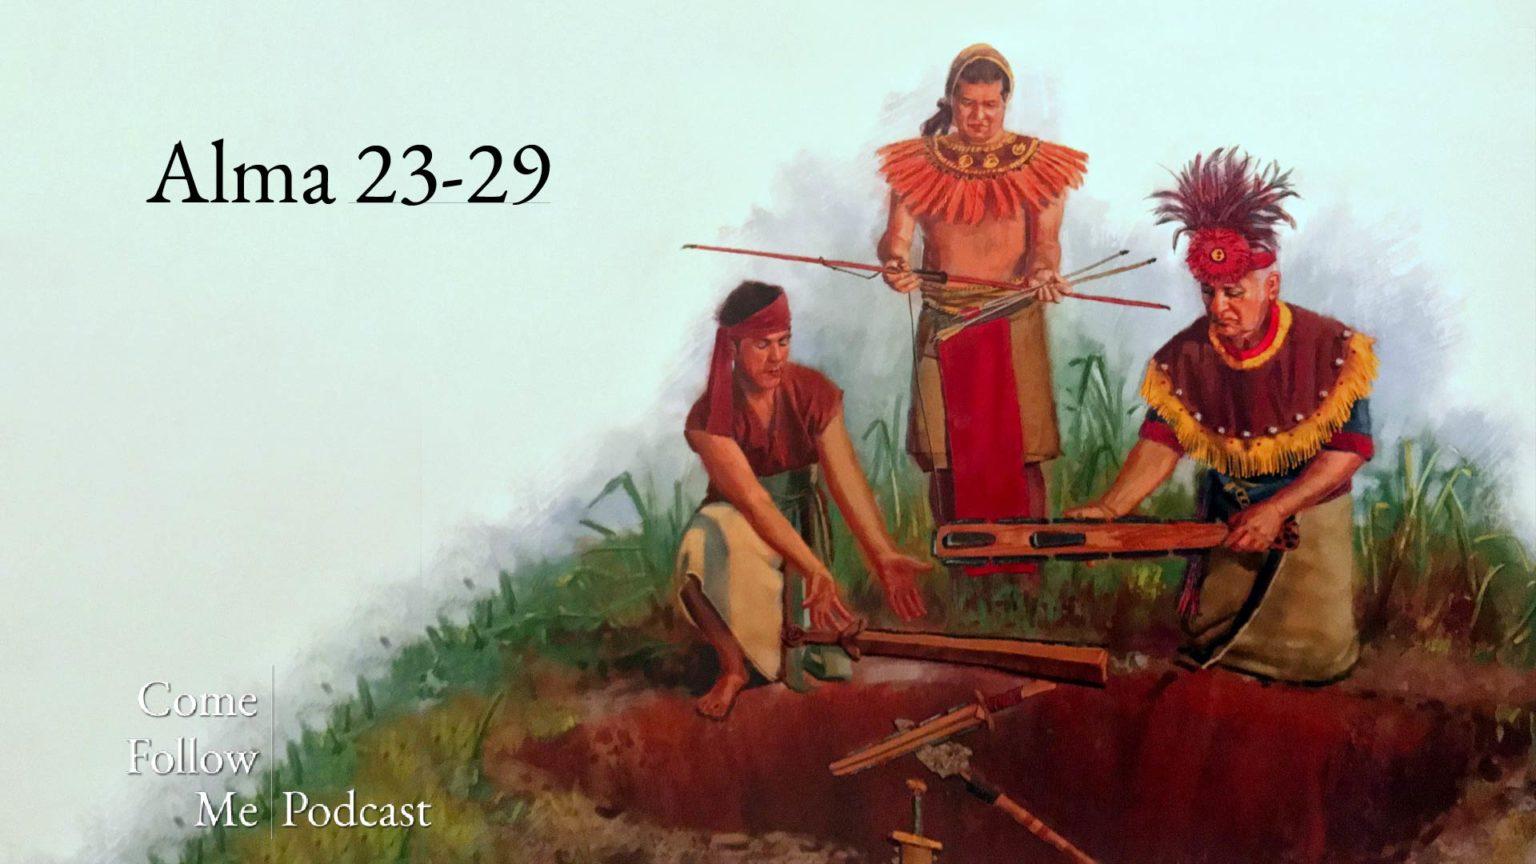 Alma 23-29